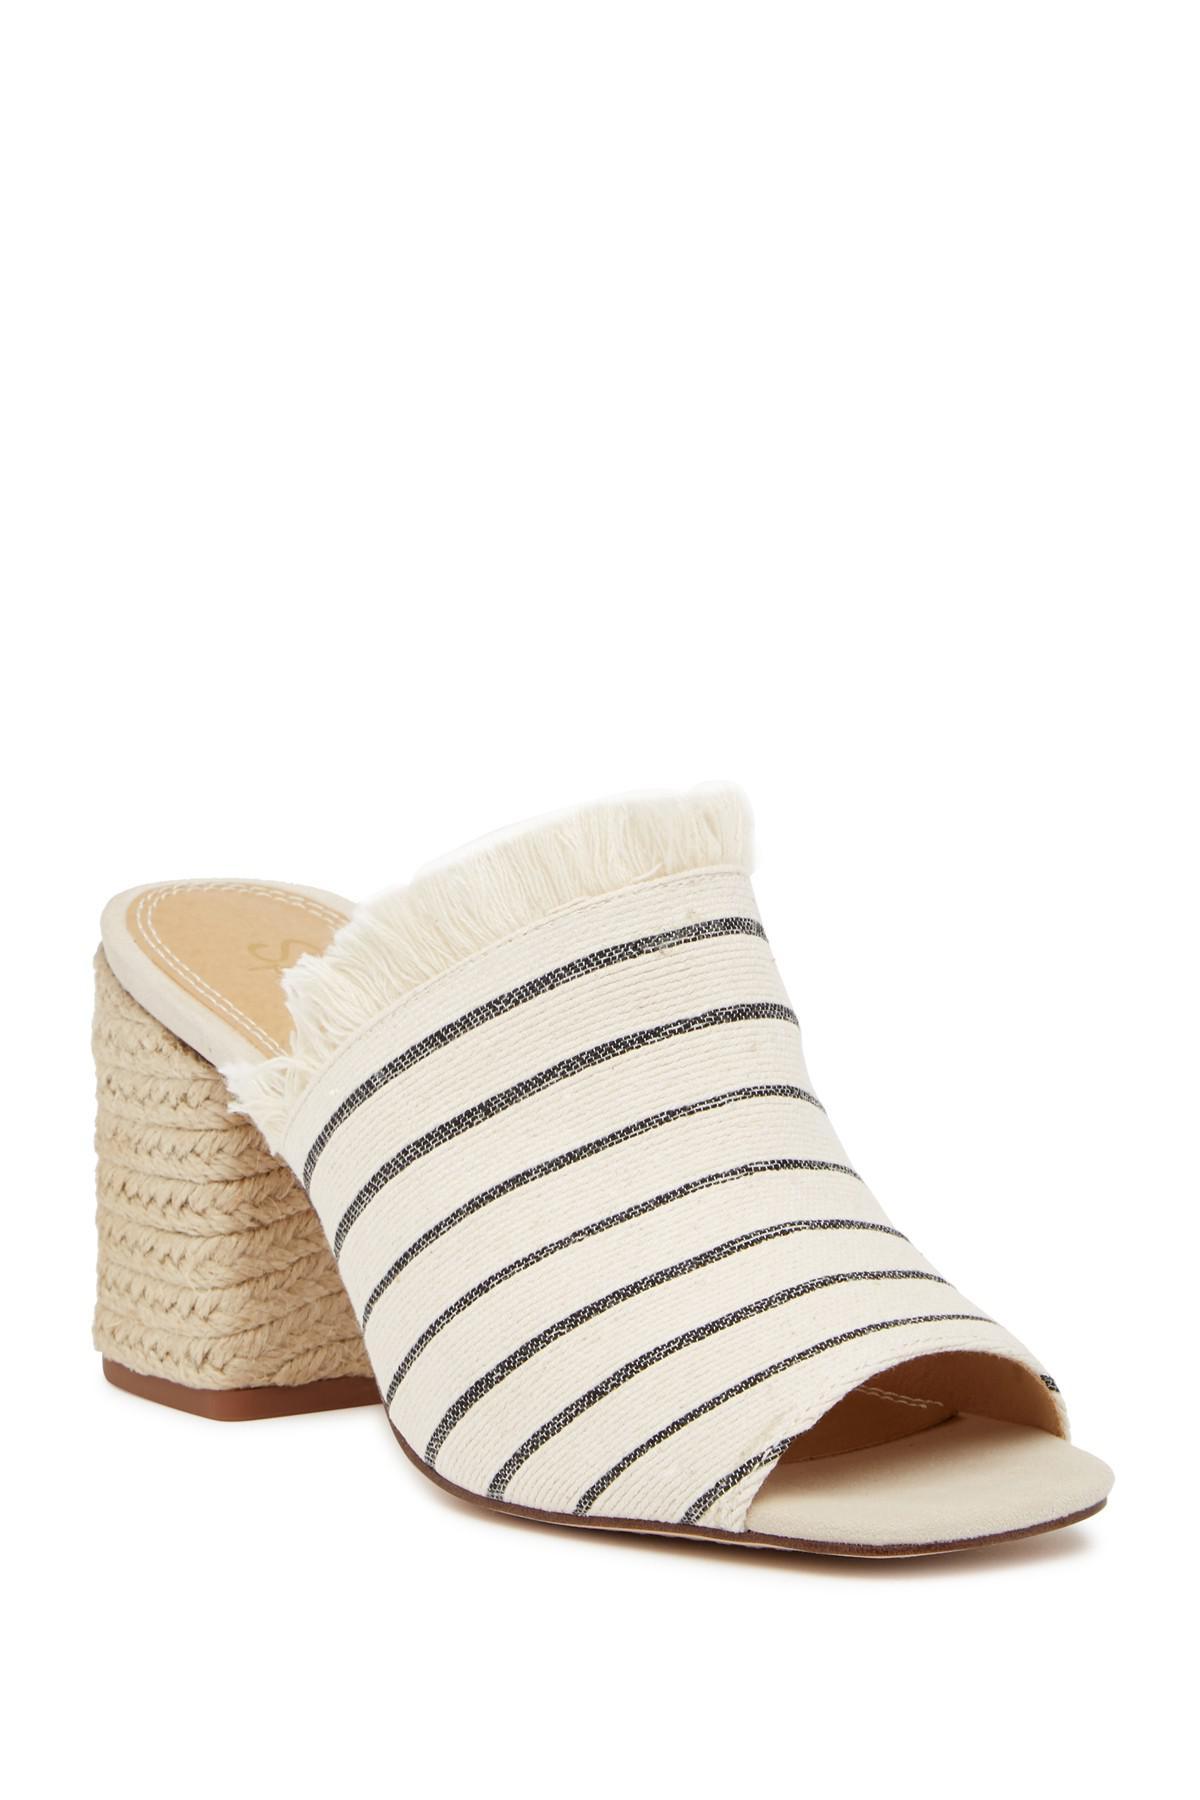 b443f6a02a5 Lyst - Splendid Baron Fringed Block Heel Slide in Natural